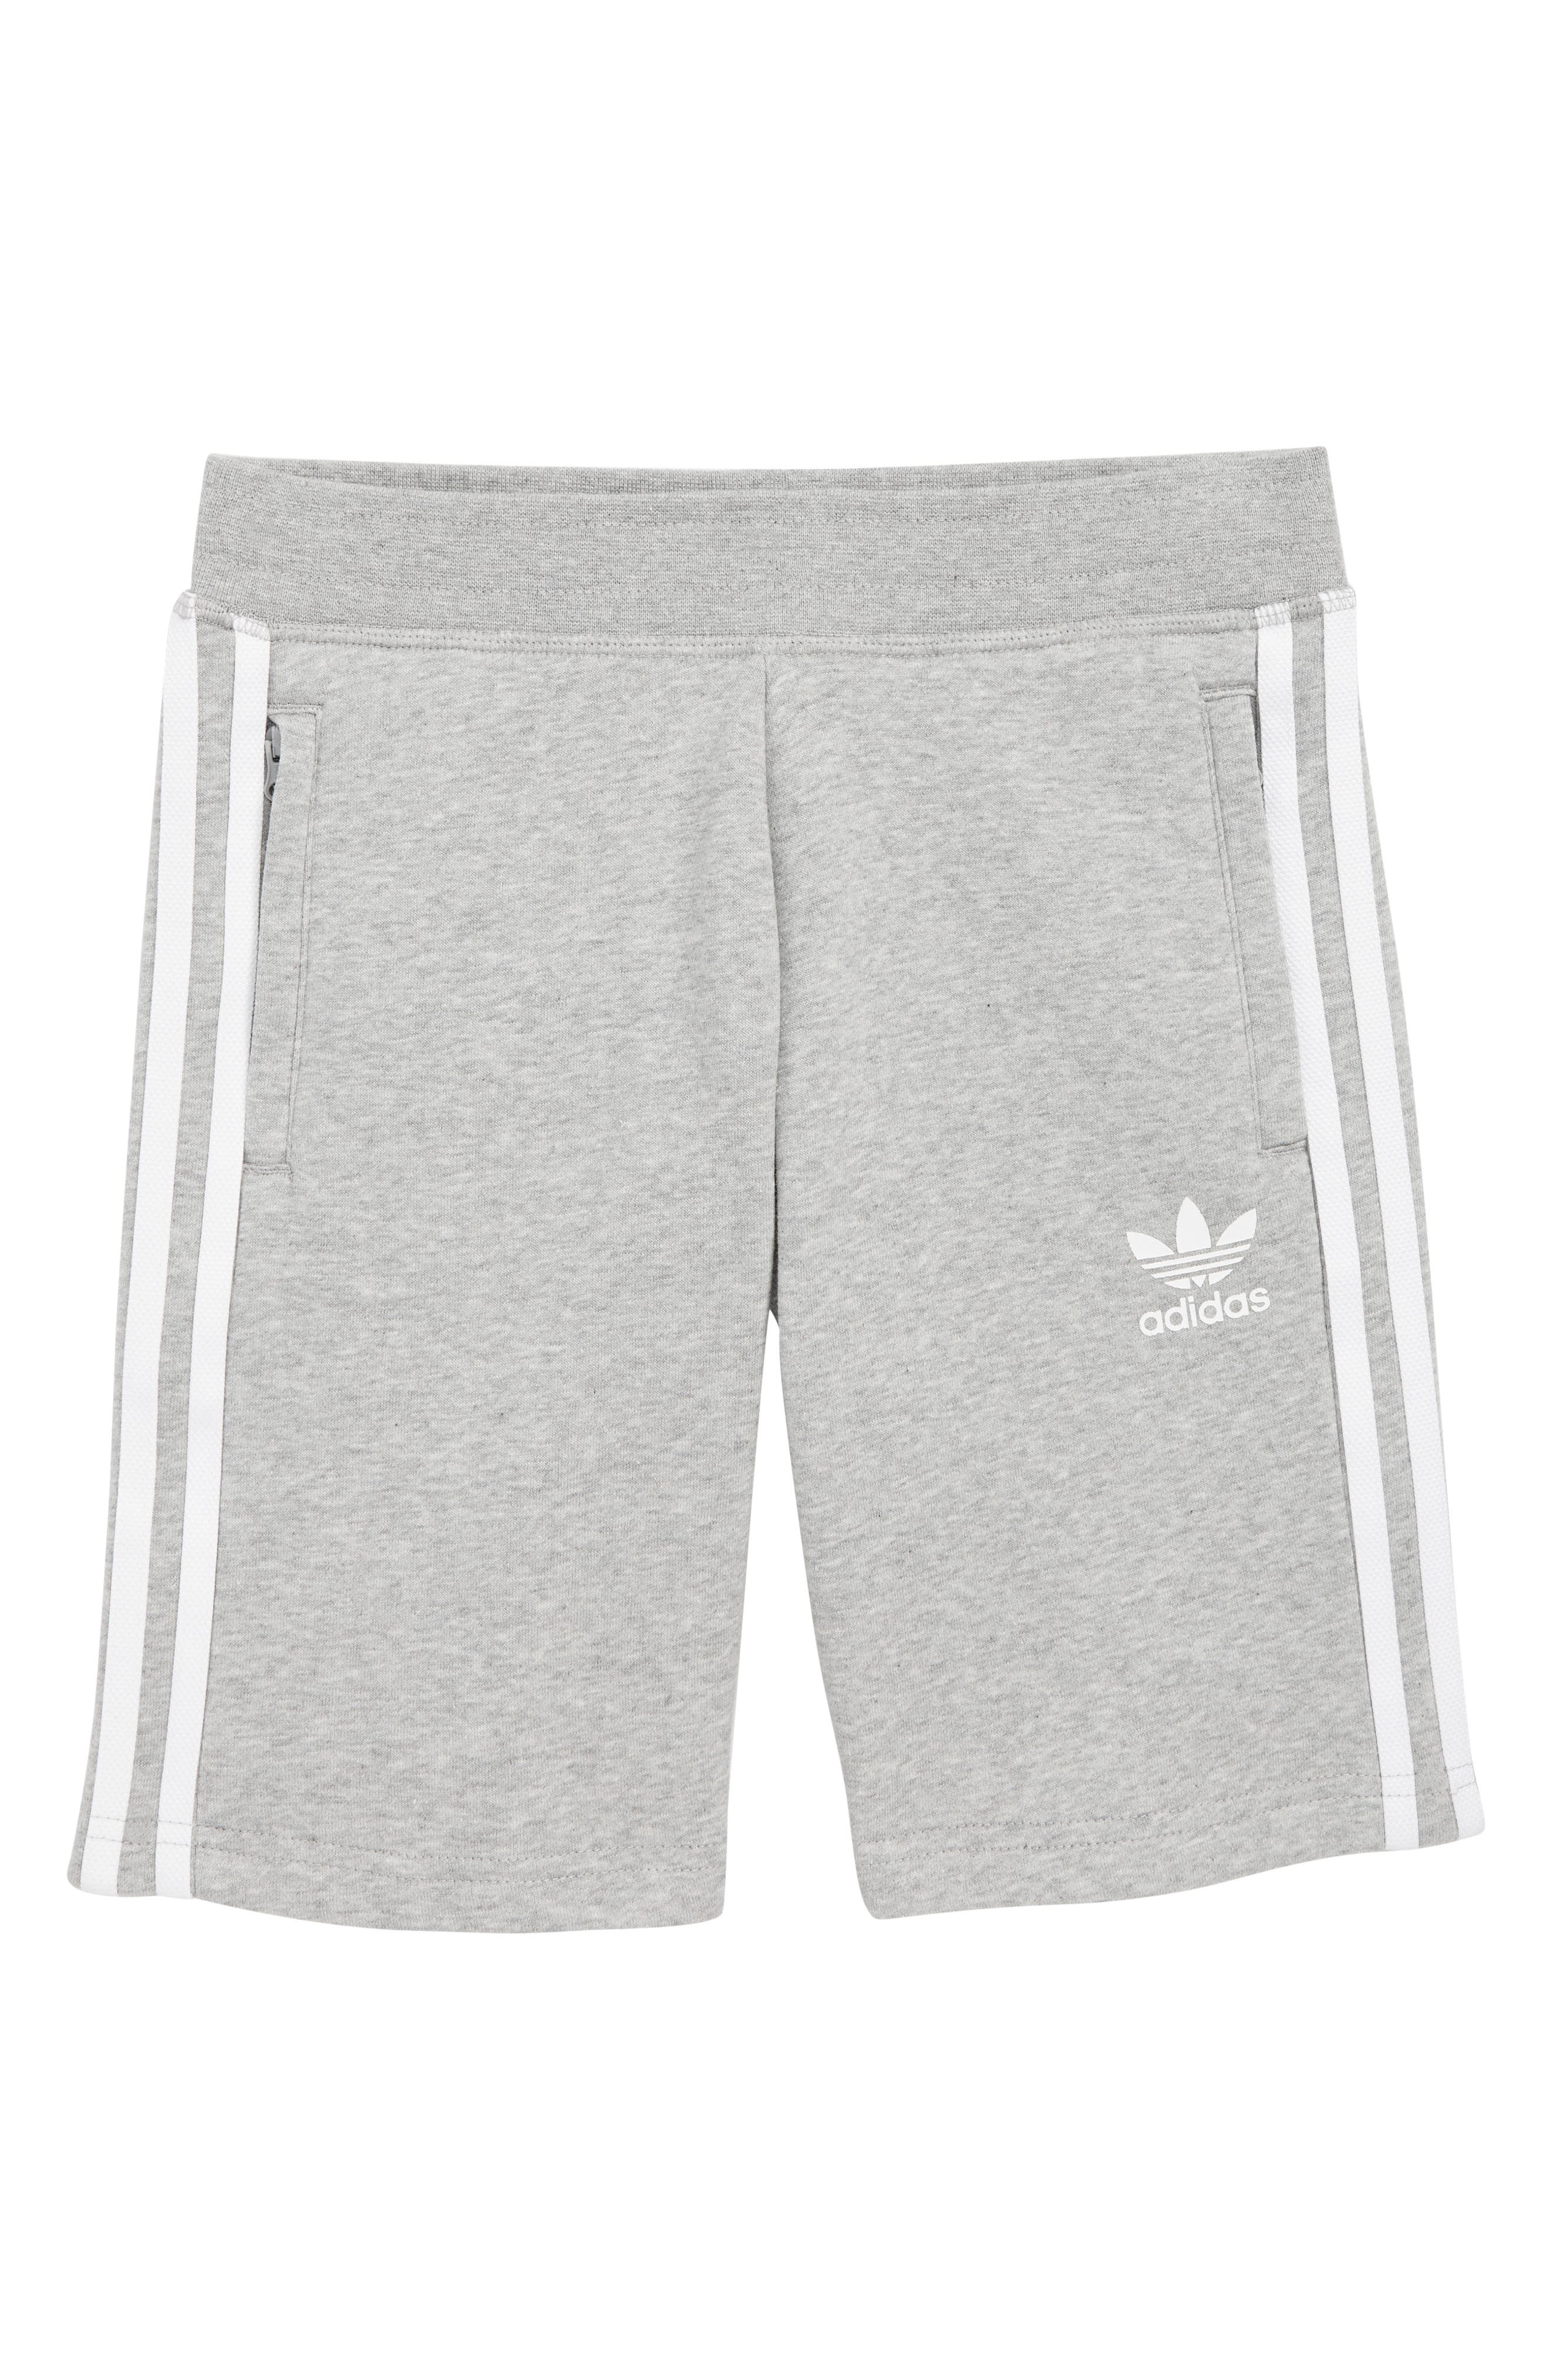 3-Stripes Sweat Shorts,                             Main thumbnail 1, color,                             MEDIUM GREY HEATHER/ WHITE